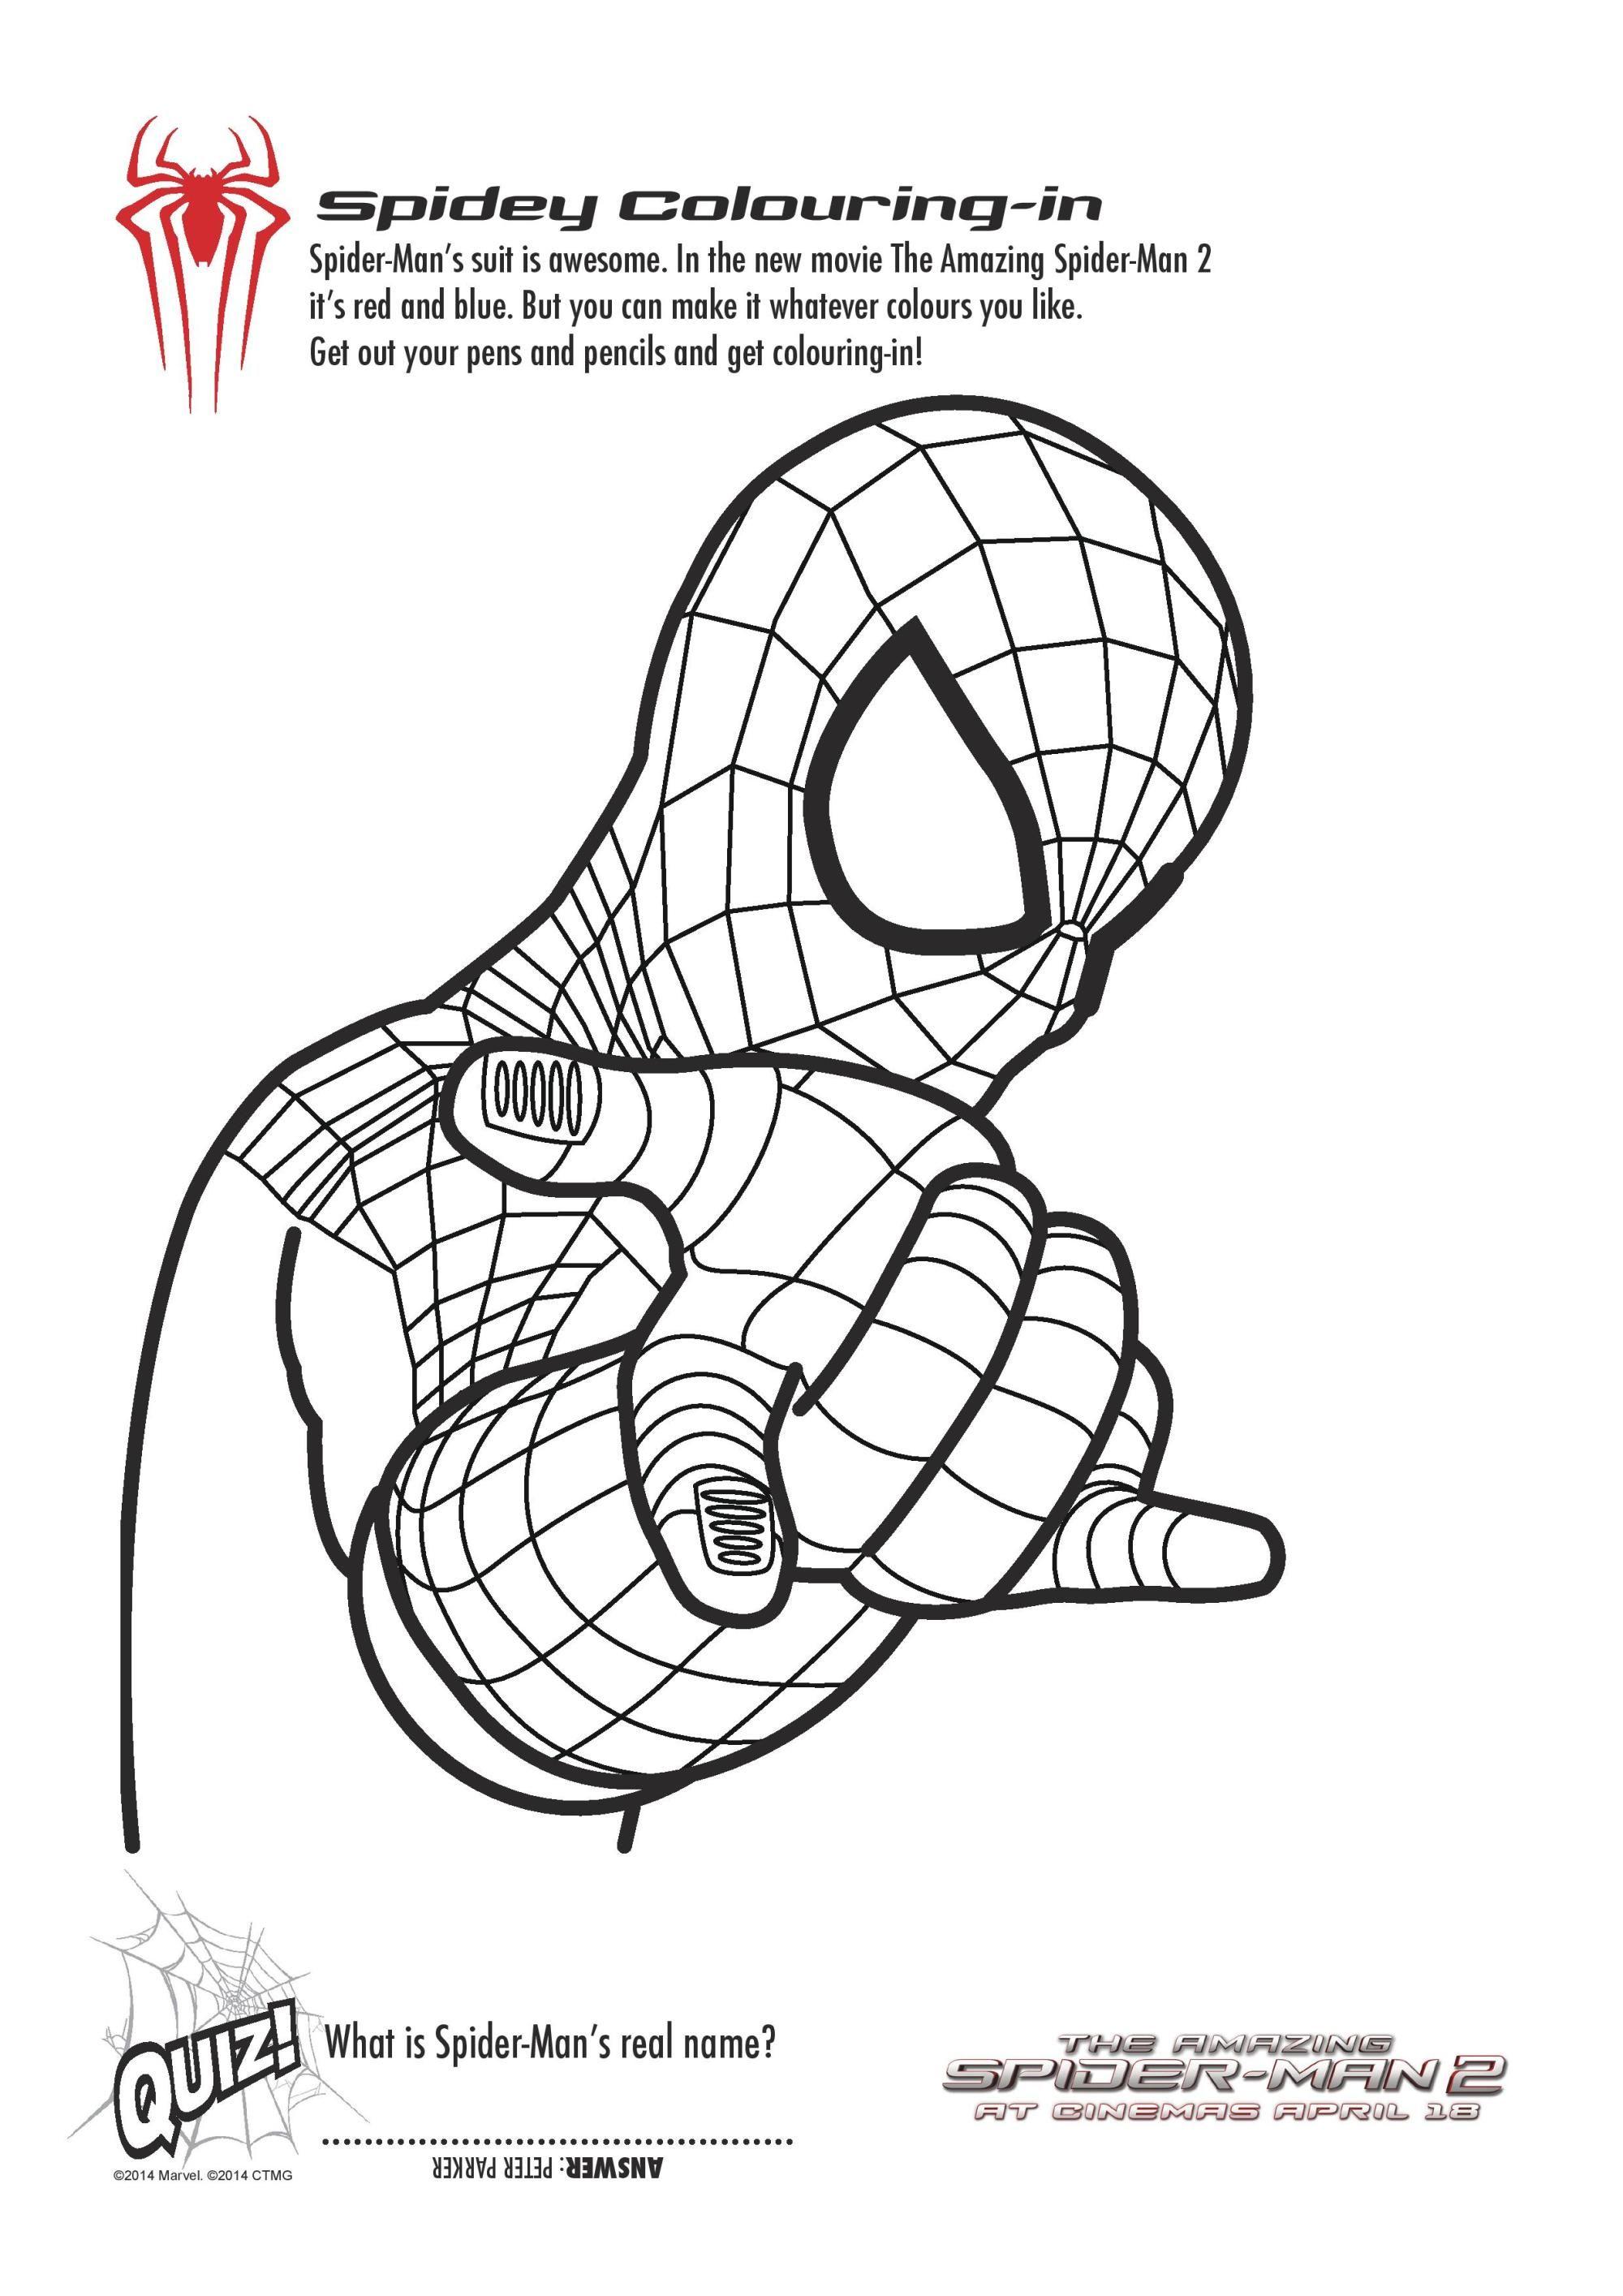 Free Printable Spiderman Colouring Pages And Activity Sheets In The Playroom Orumcek Adam Boyama Sayfalari Inanilmaz Orumcek Adam